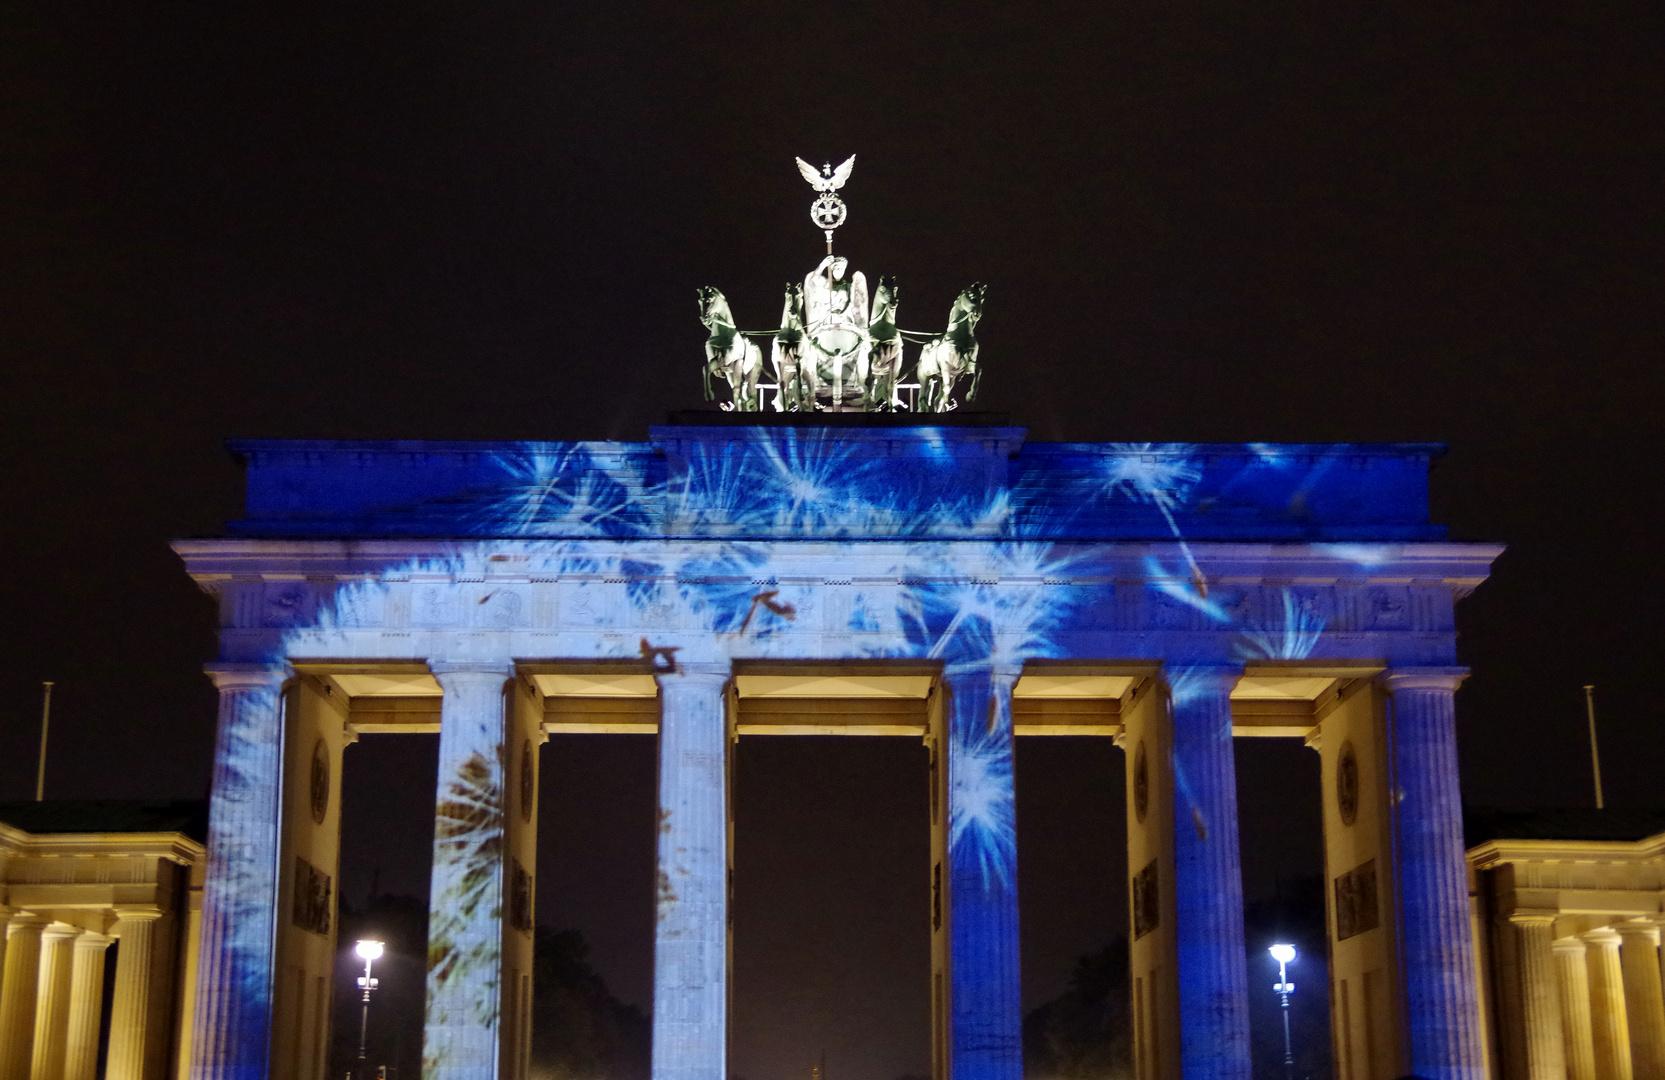 Art of Lights - Berlin 2014 - Brandenburger Tor